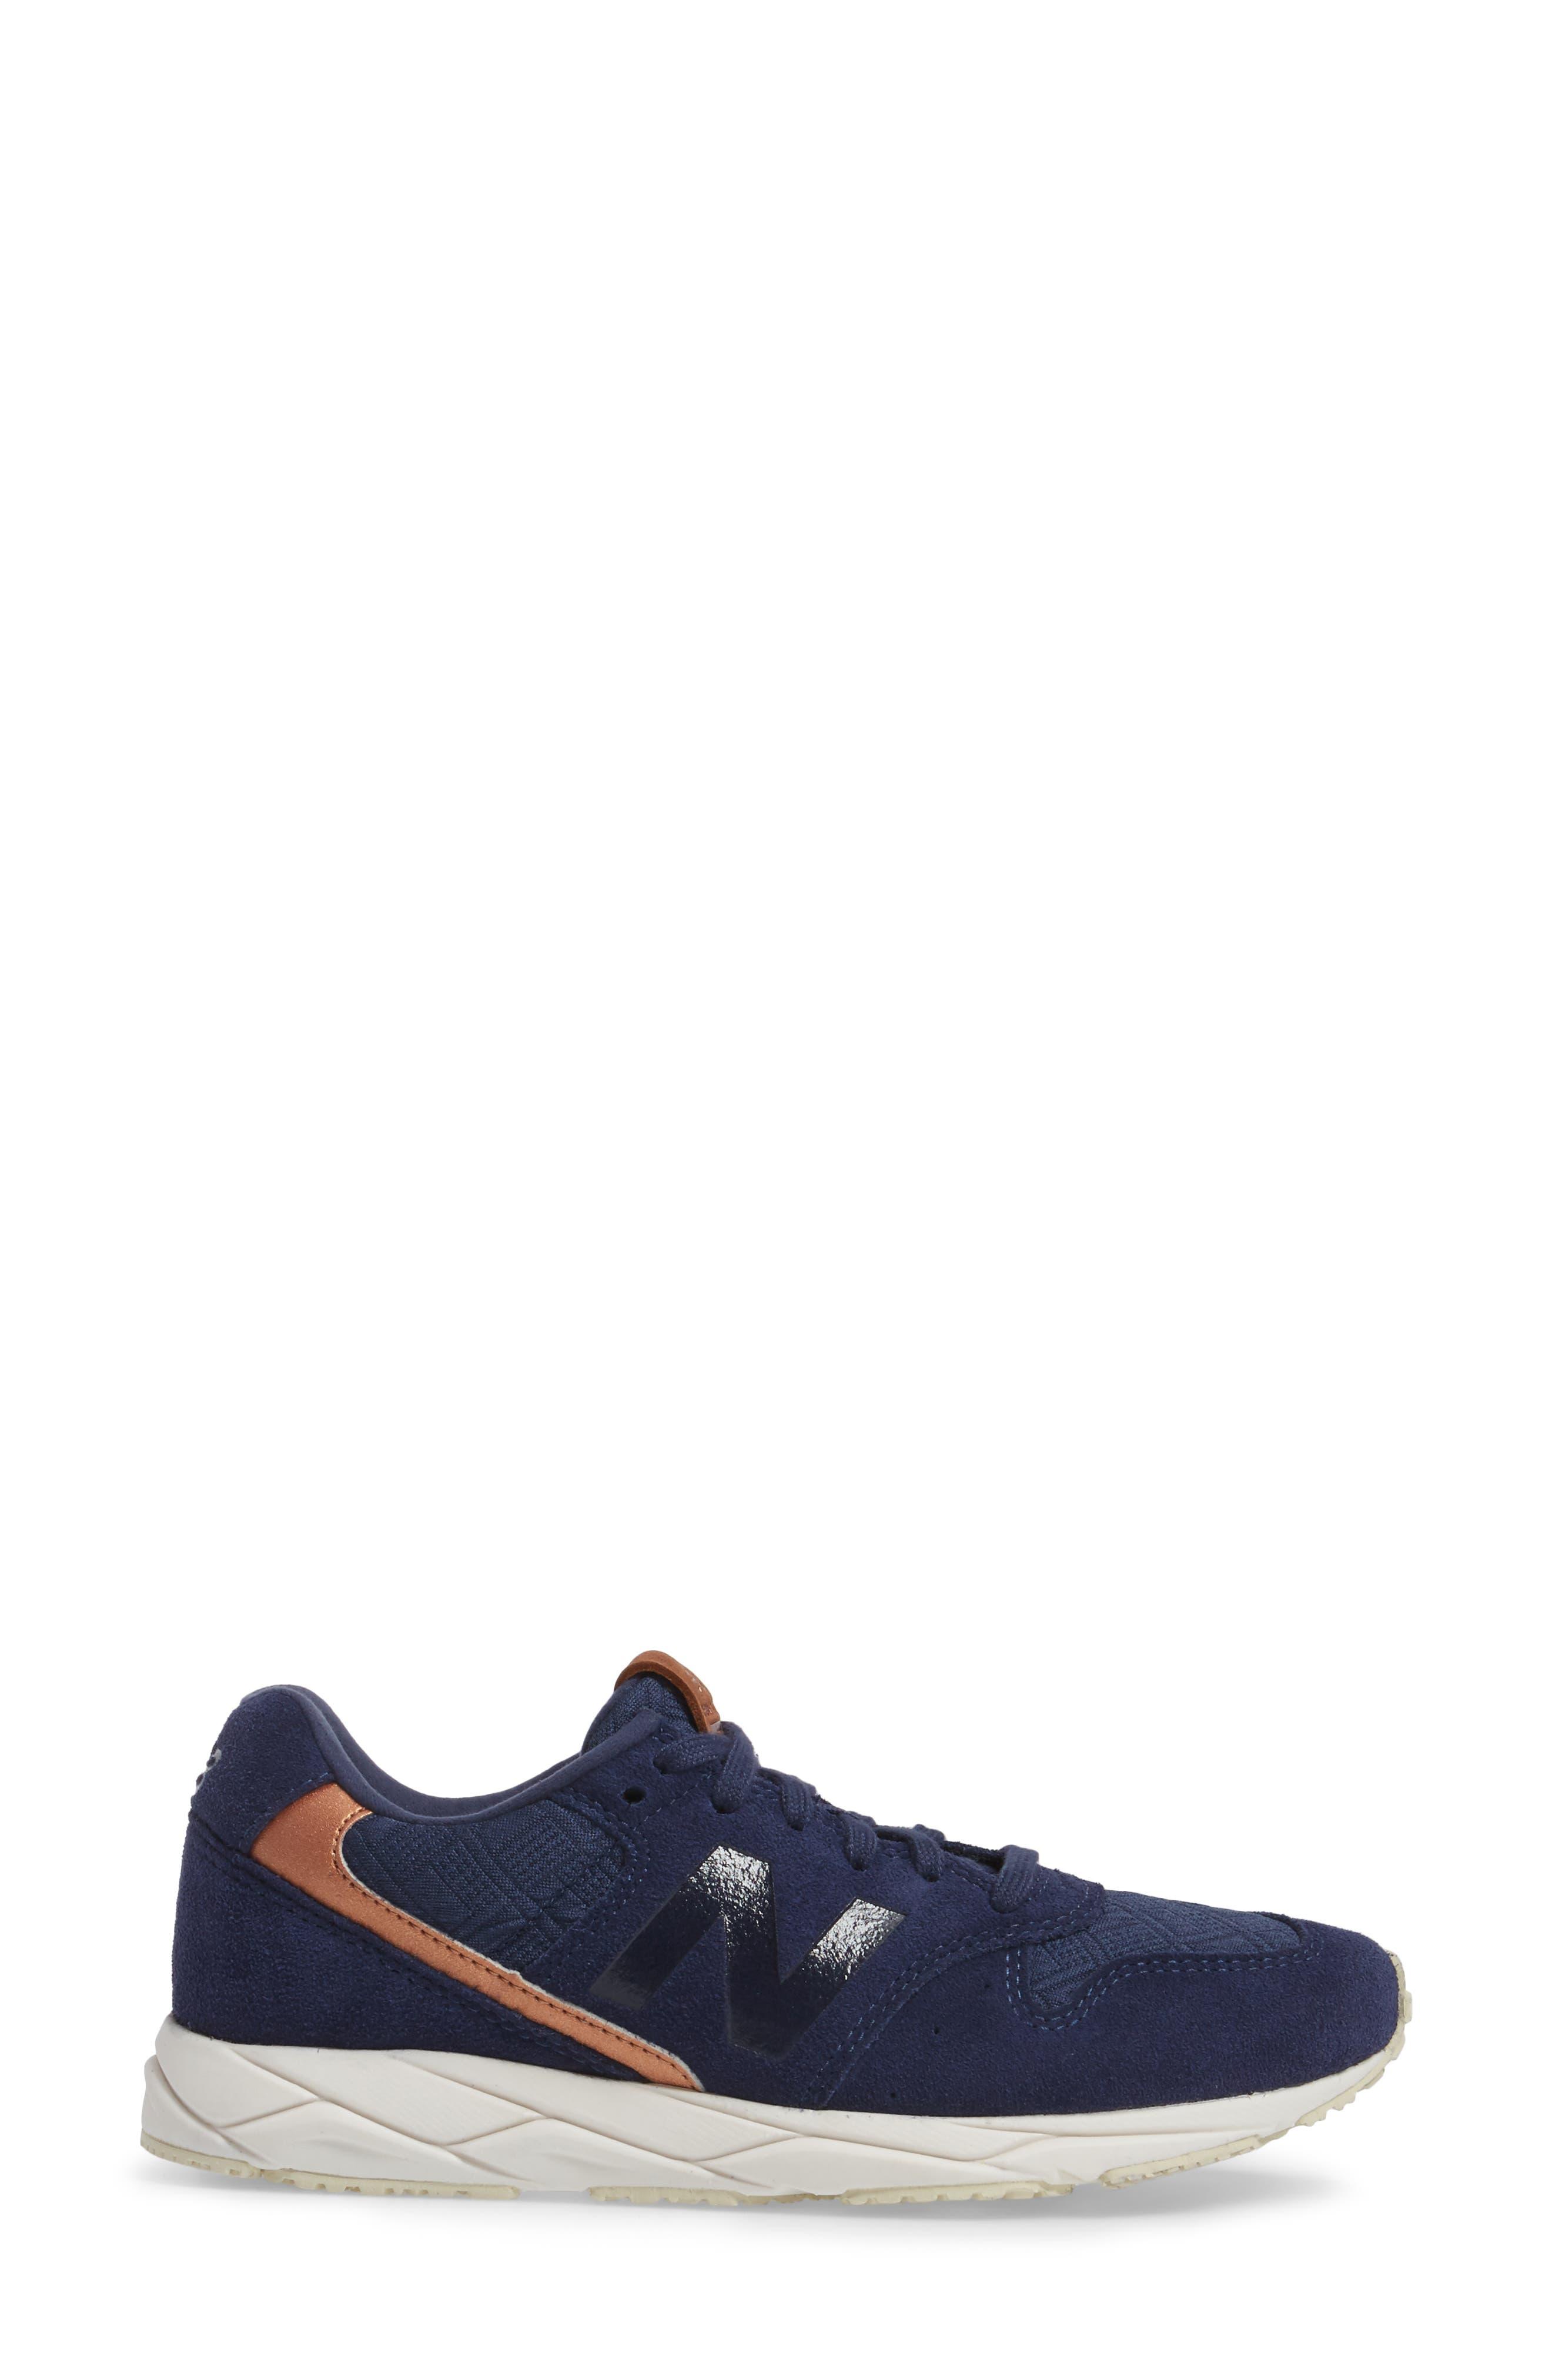 96 Mash-Up Sneaker,                             Alternate thumbnail 16, color,